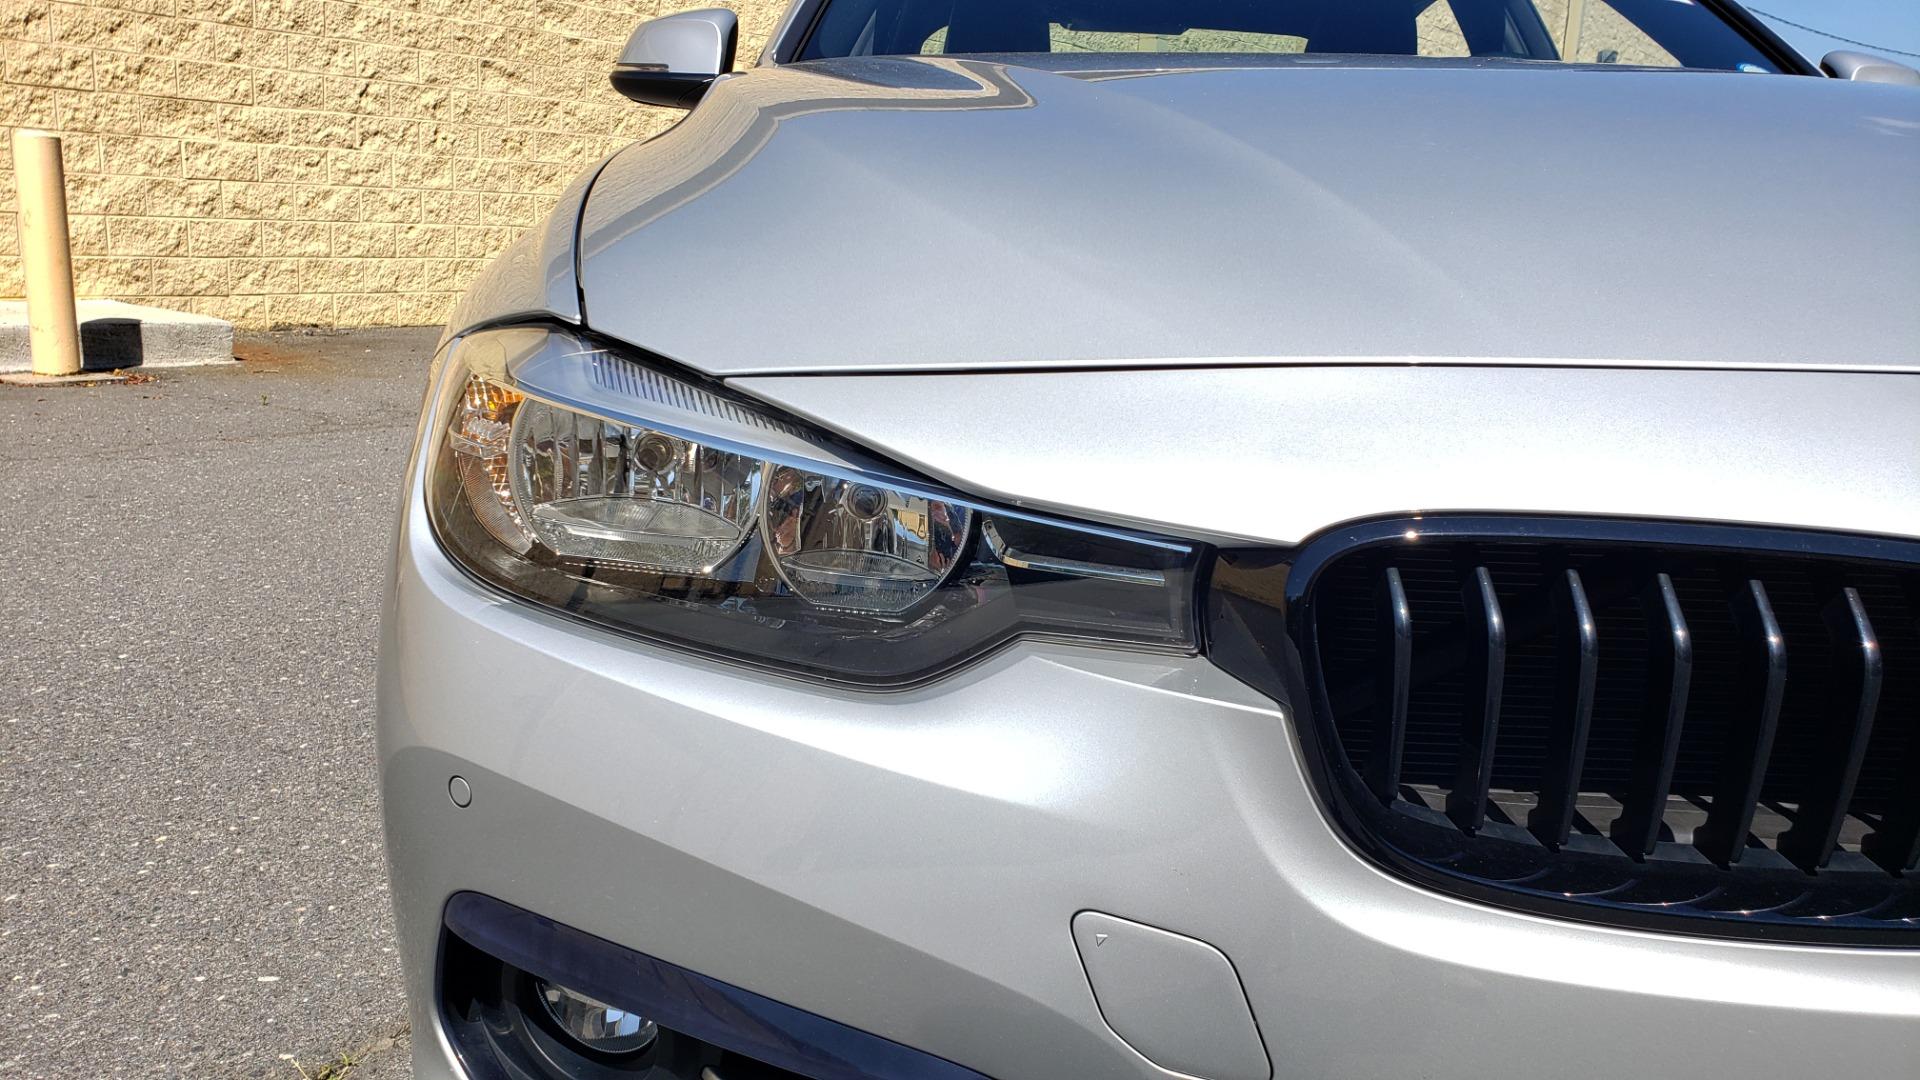 Used 2017 BMW 3 SERIES 330I SPORT SEDAN / DRVR ASST PKG / SUNROOF / REARVIEW for sale Sold at Formula Imports in Charlotte NC 28227 20